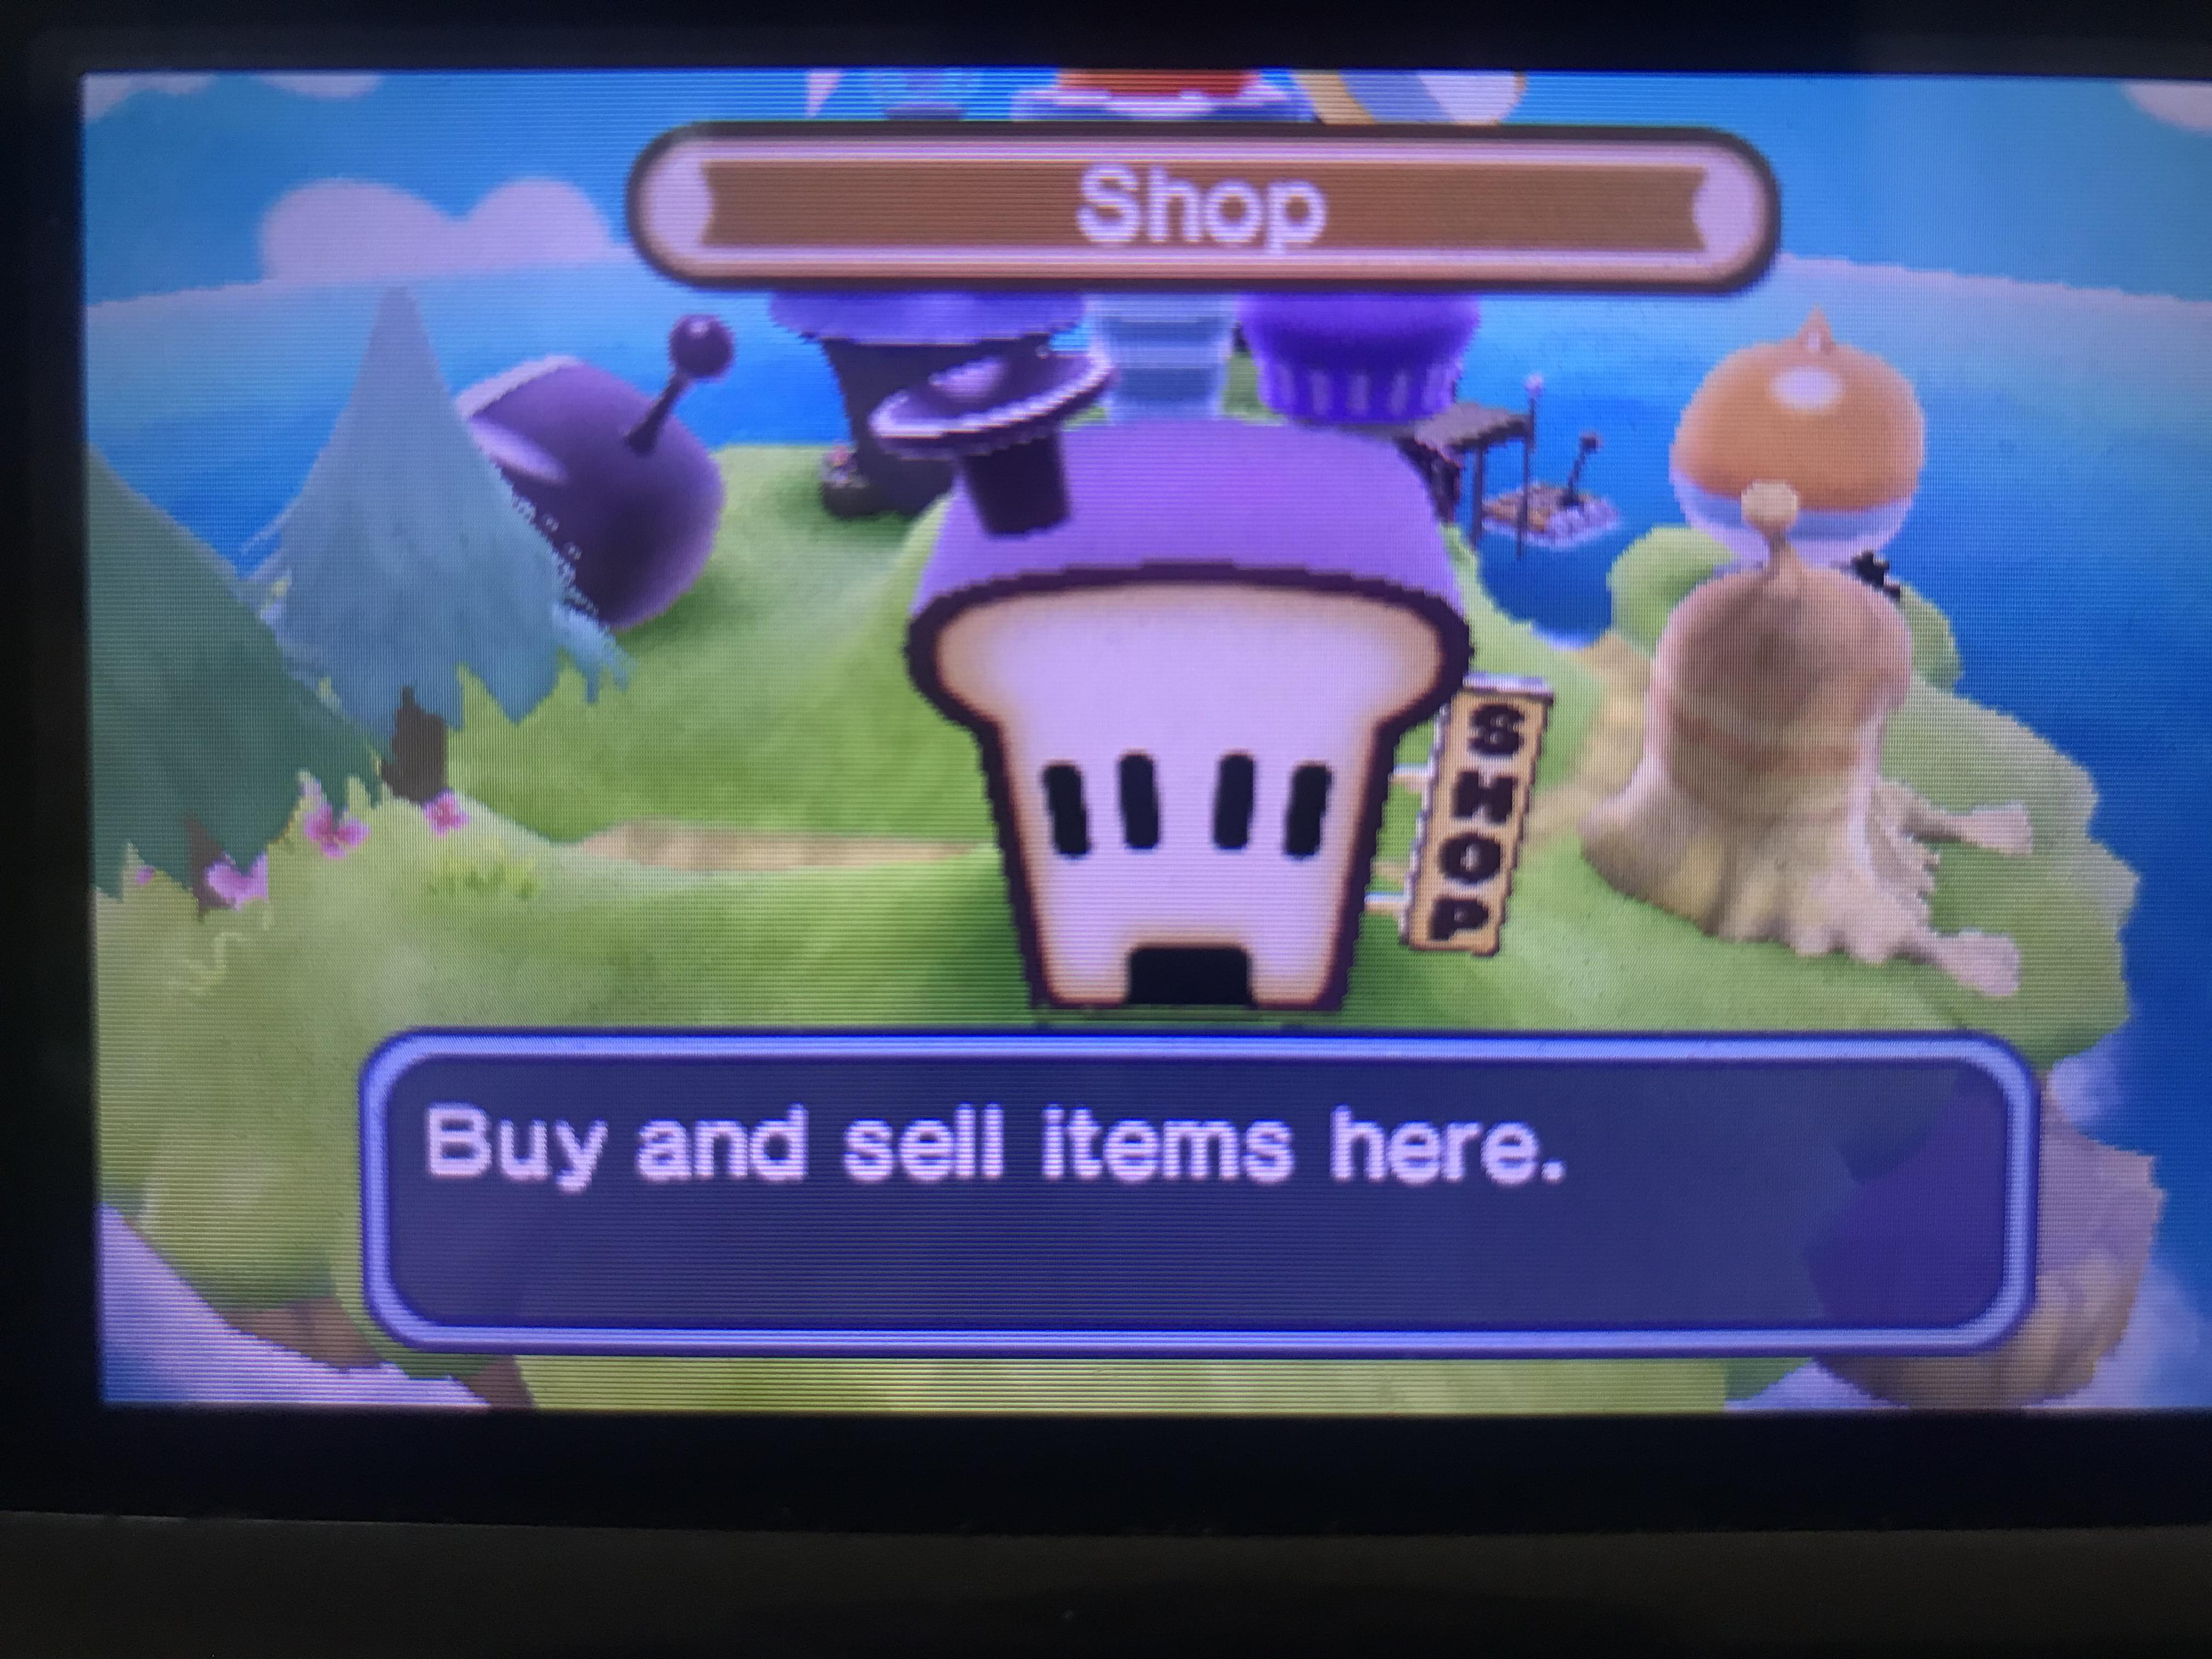 Fichier:Shop.jpg